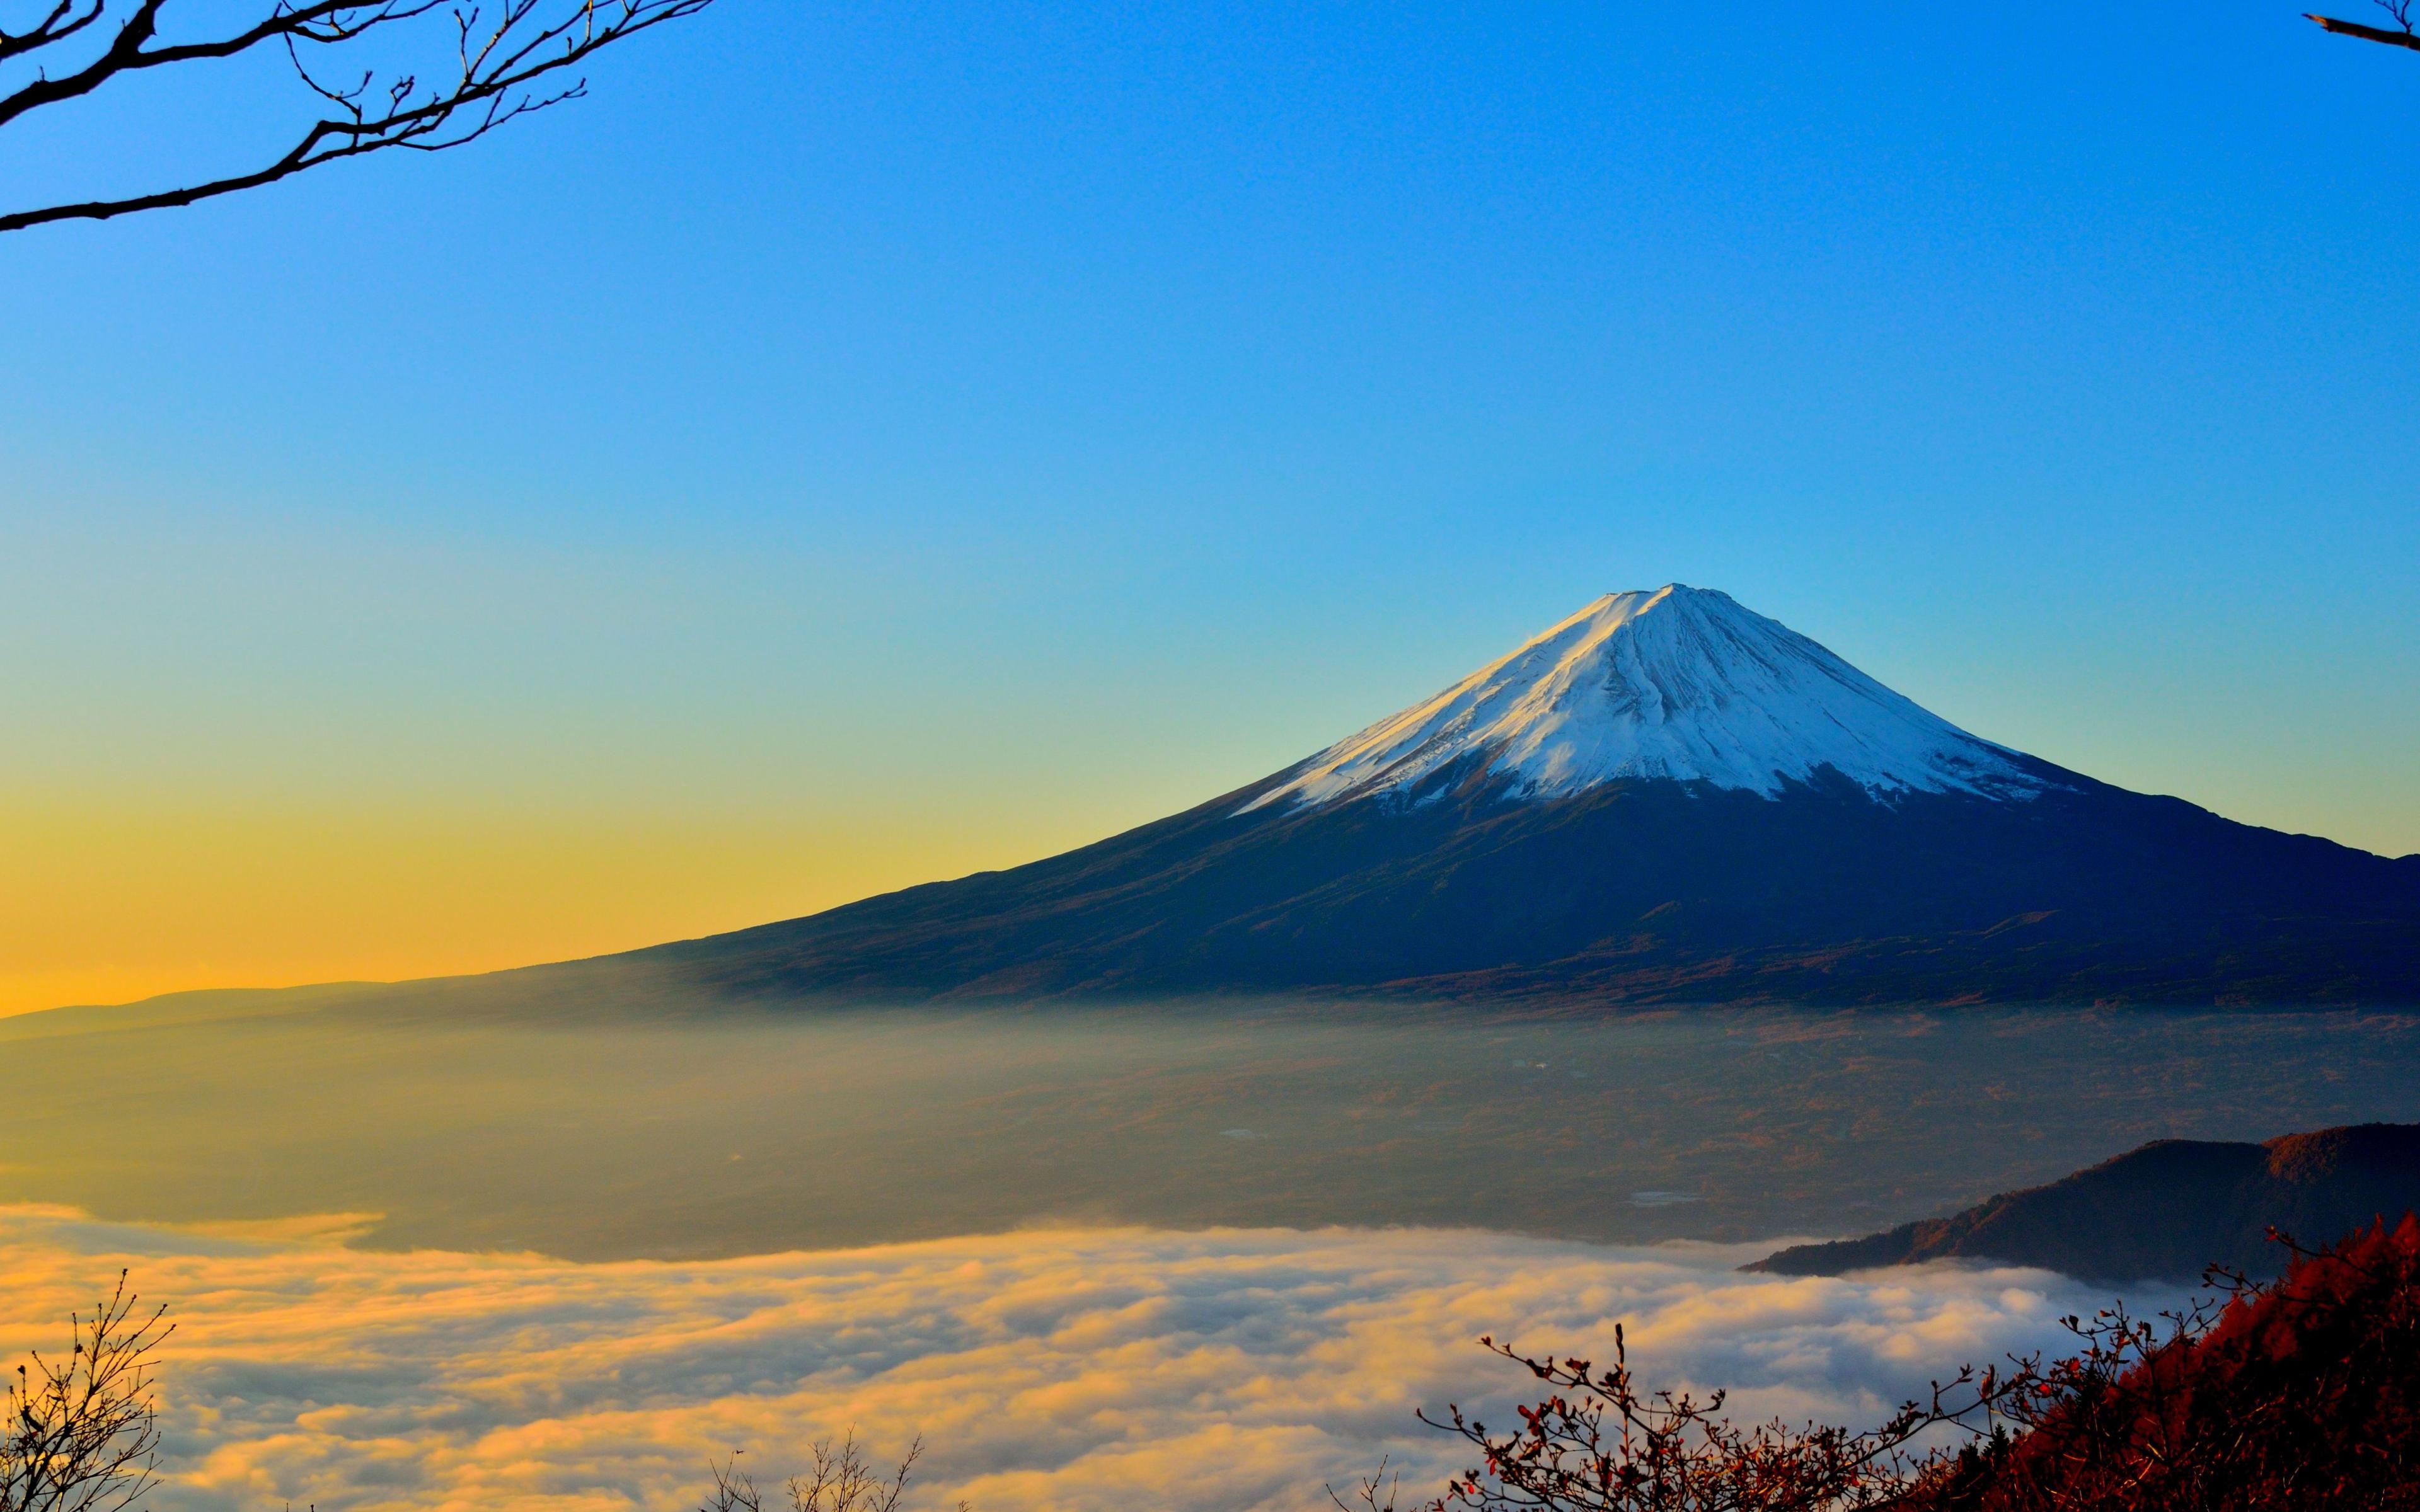 Mount Fuji Sunrise Hd 4k Wallpaper